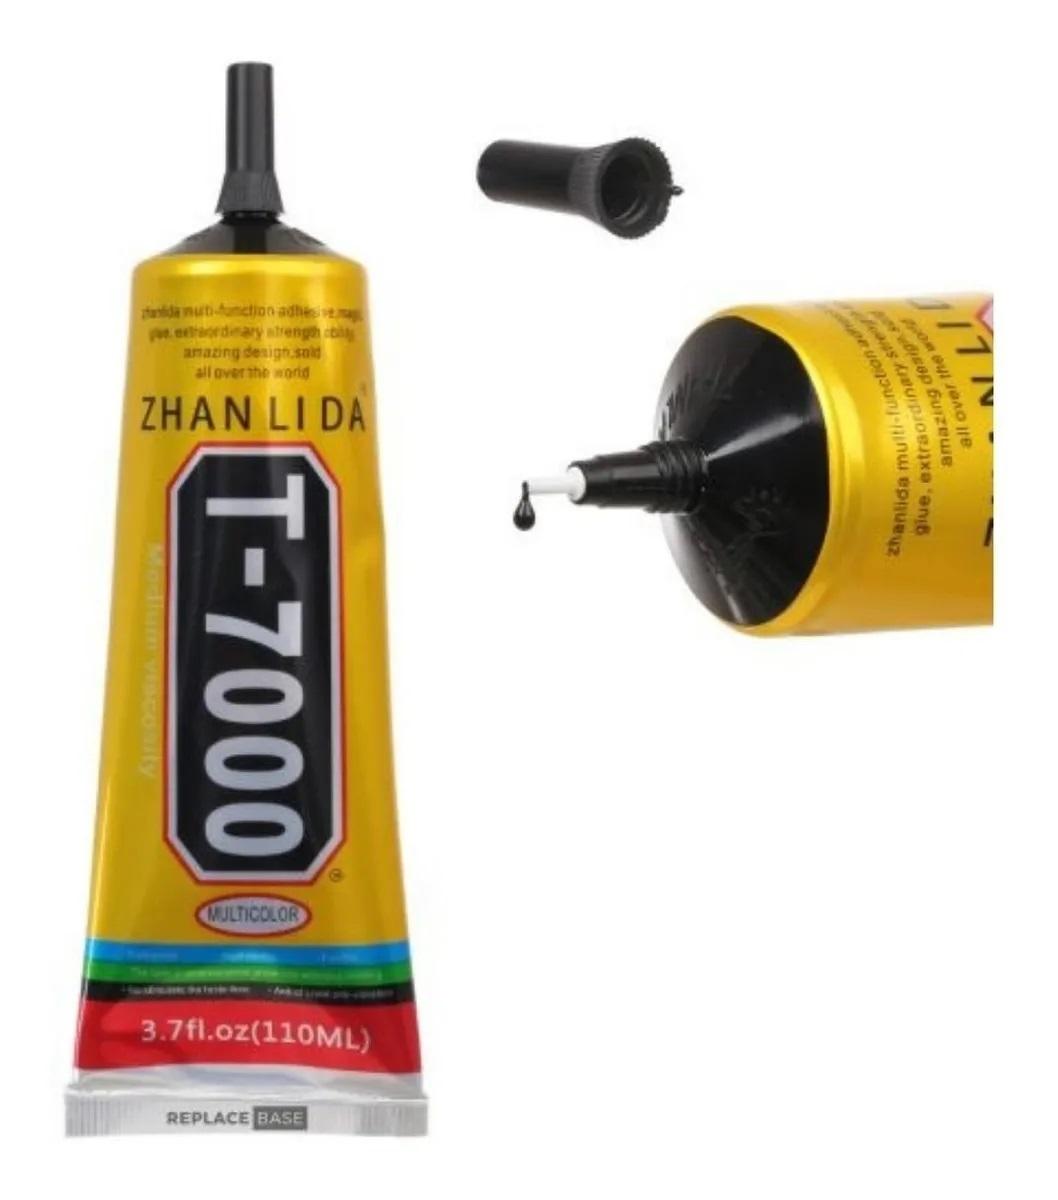 Cola Adesiva Multiuso para tela do celular T7000 / T-7000 110ml